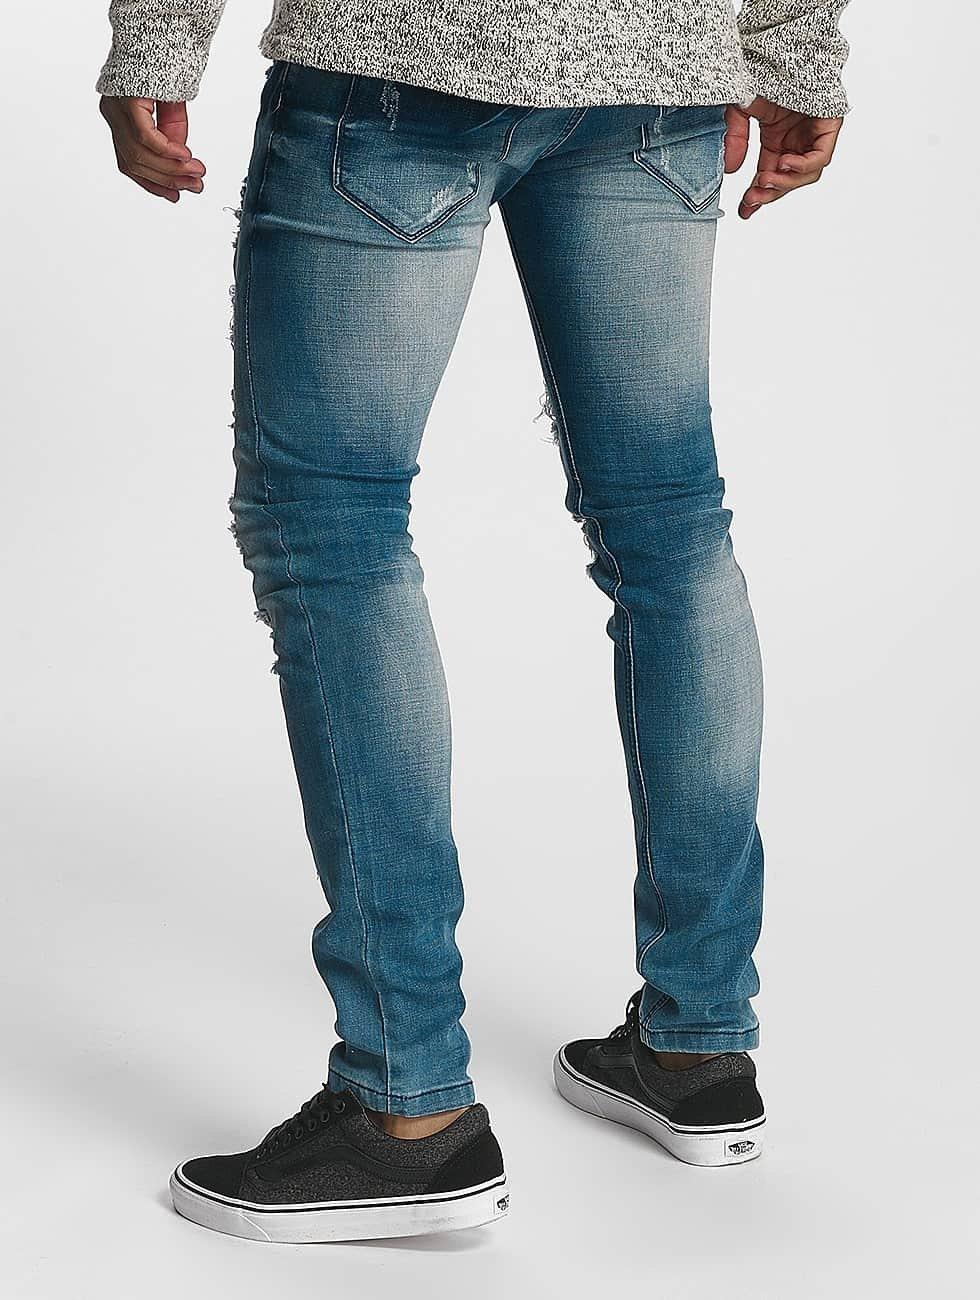 Leg Kings Jeans ajustado Kayden azul